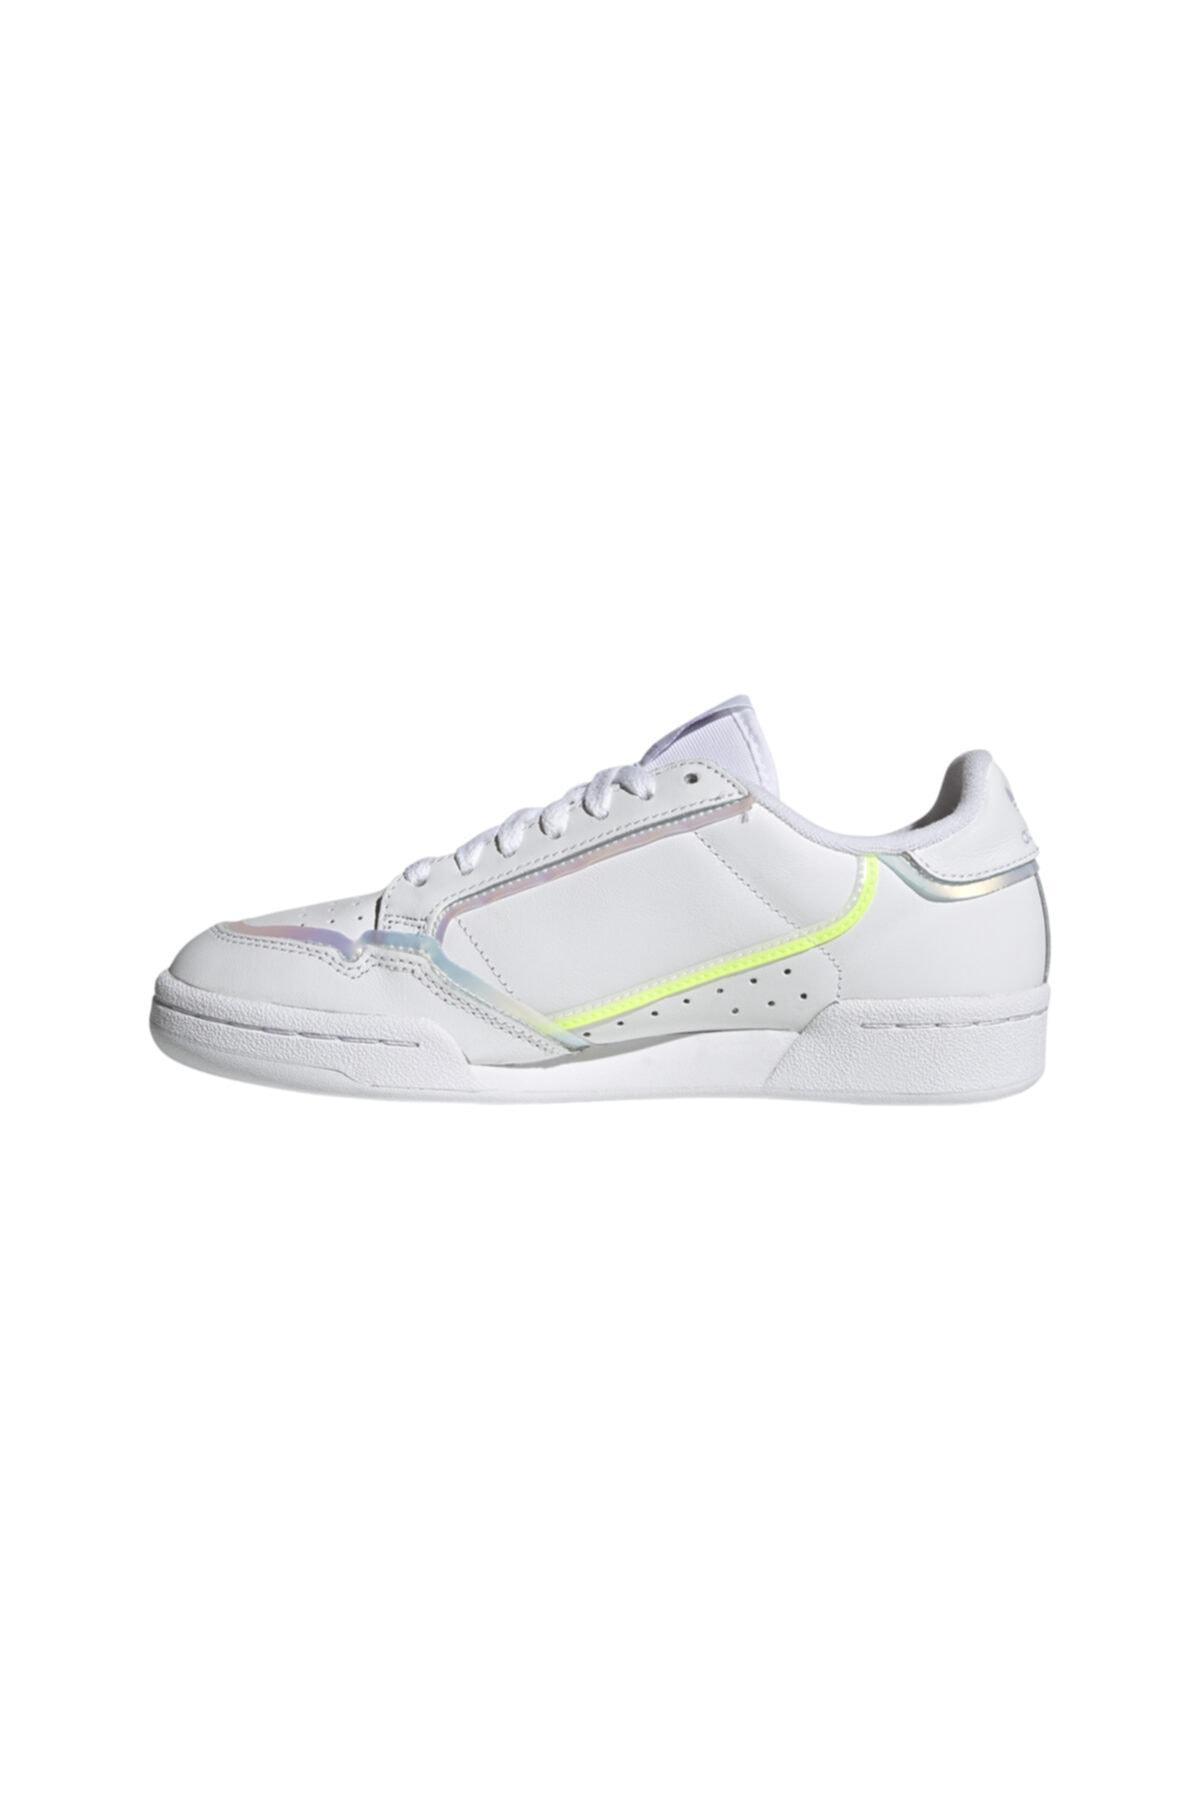 adidas Continental 80 Kadın Spor Ayakkabı 2